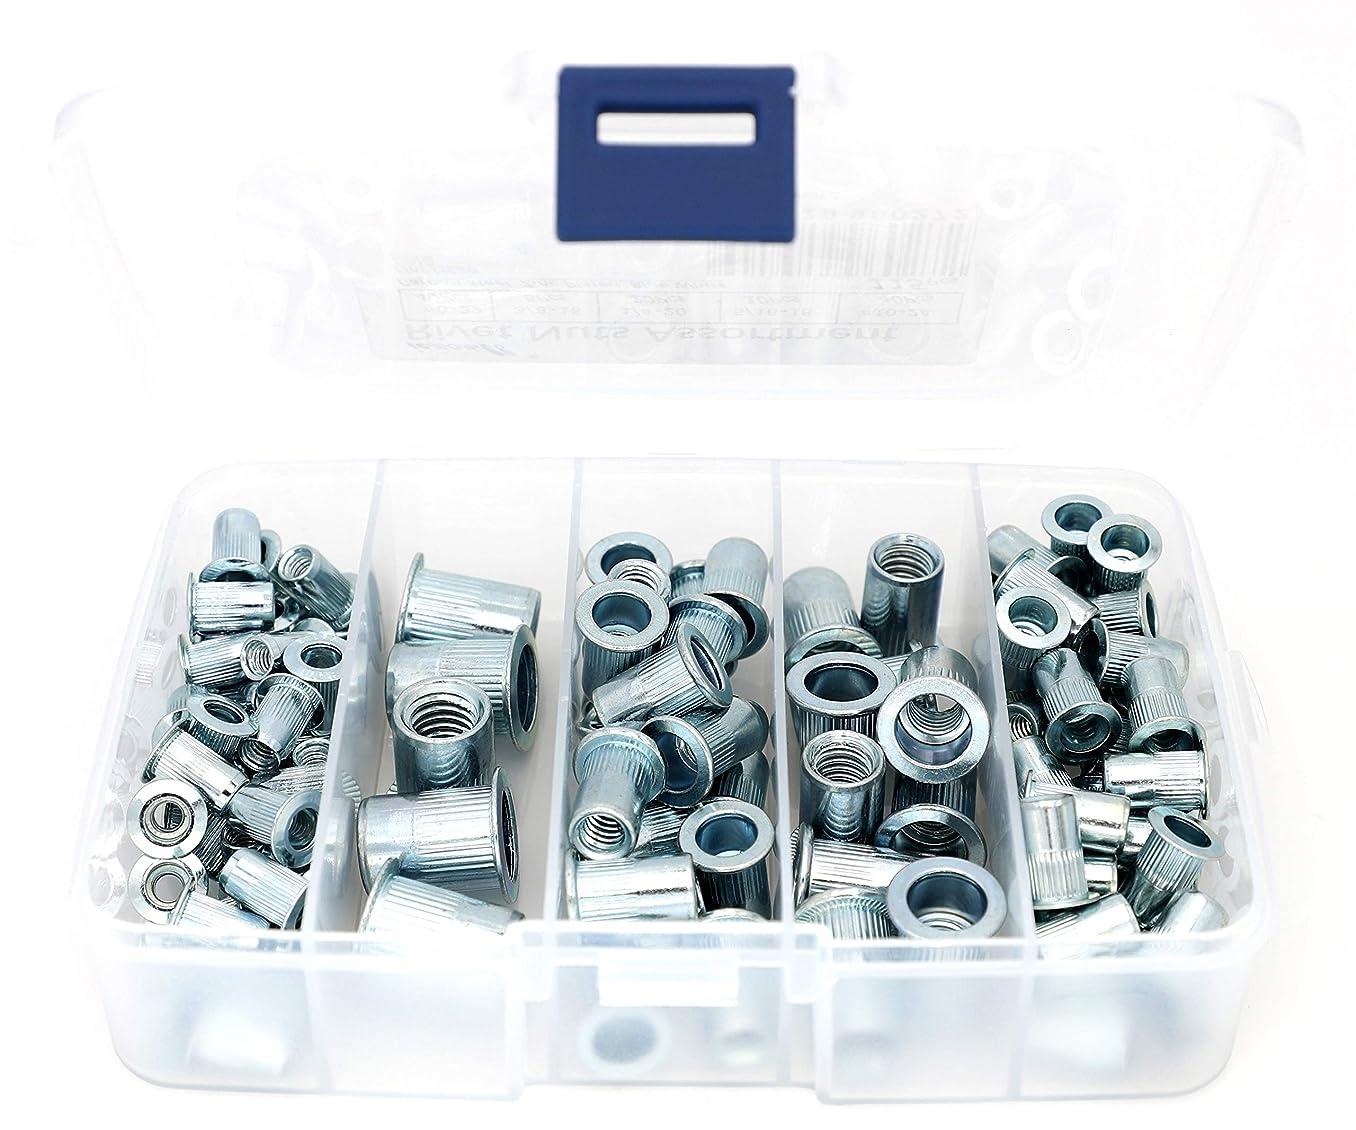 iExcell 115 Pcs #8-32#10-24 1/4-20 5/16-18 3/8-16 Carbon Steel UNC Rivet Nuts Kit, Blue White Zinc Plated Finish, Flat Head